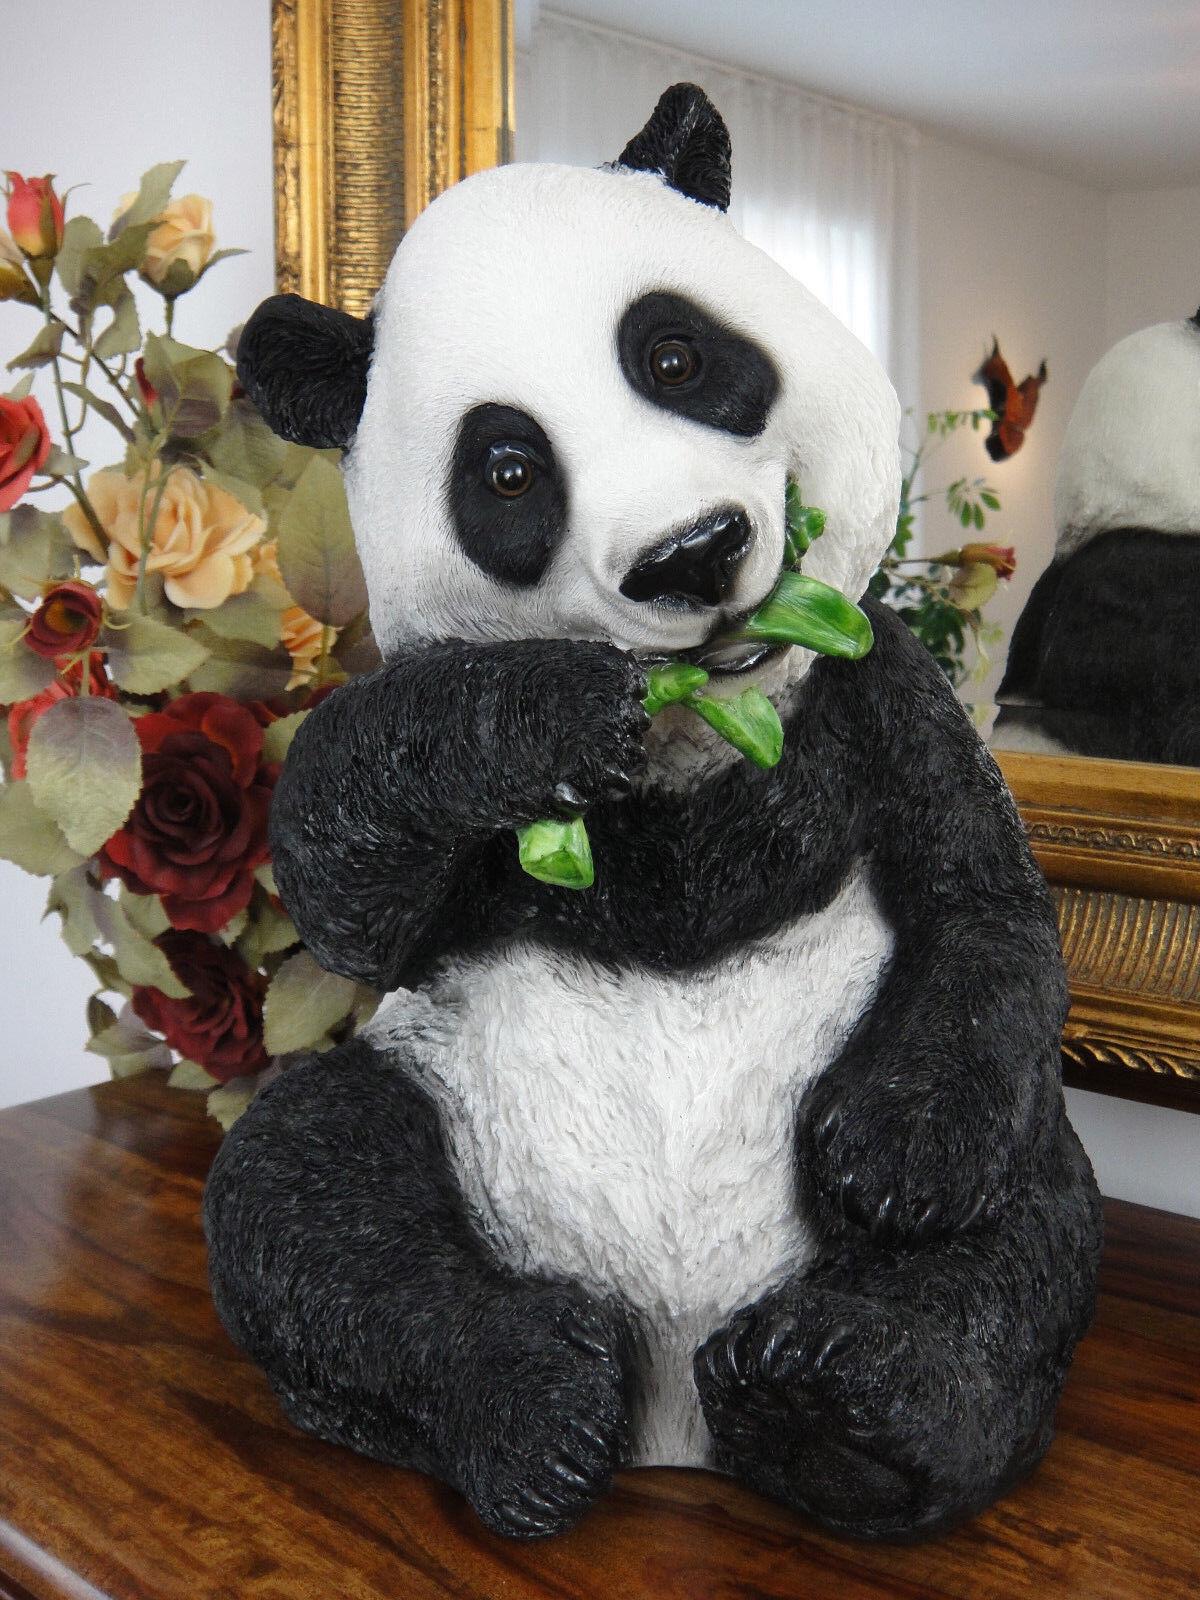 Figura decorativa panda oso 35 cm jardín personaje mano pintado escultura de jardín estatua asia XL